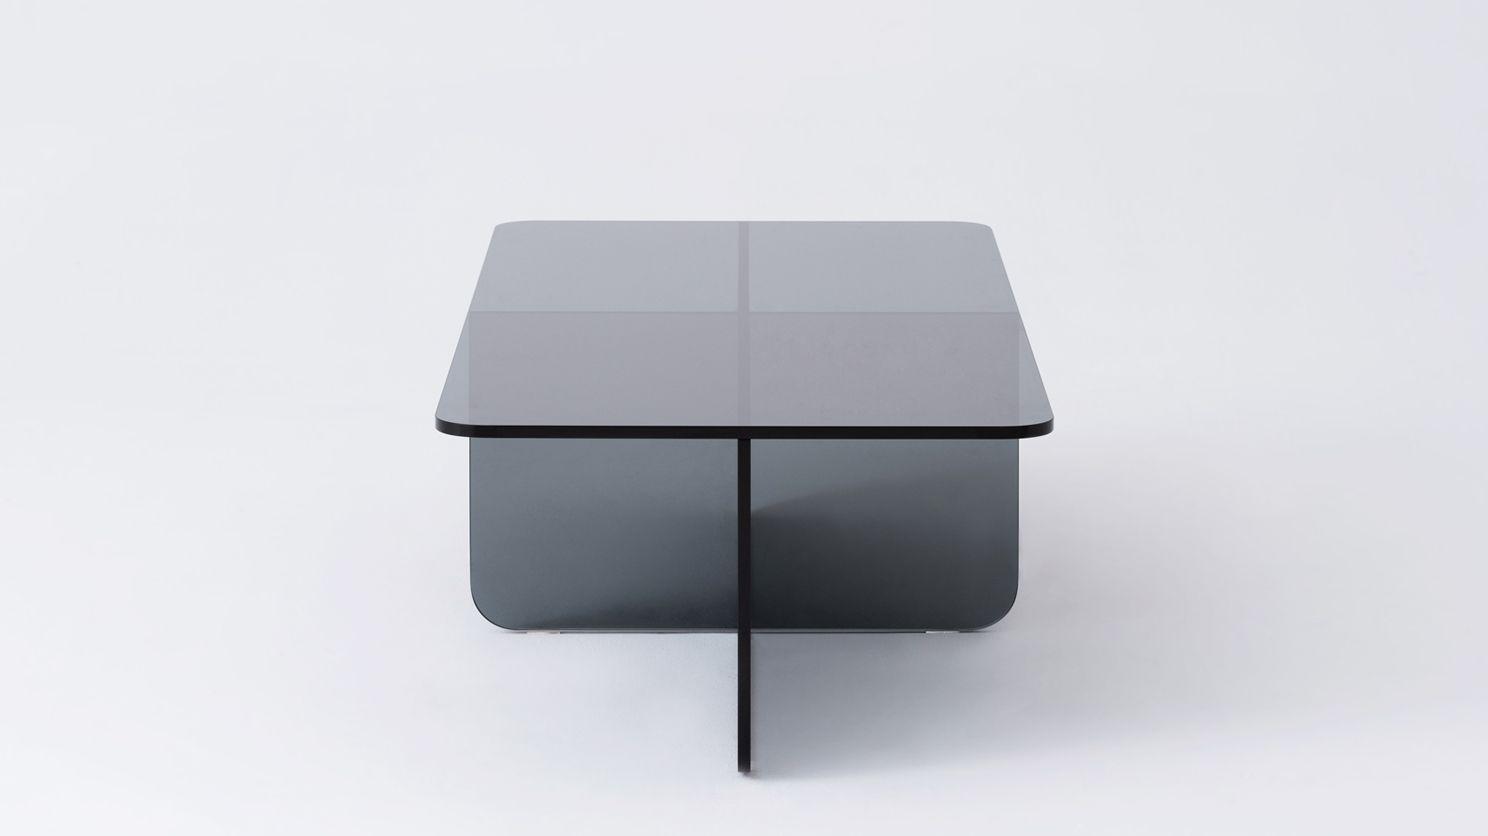 Verre Rectangular Coffee Table Eq3 Rectangular Coffee Table Coffee Table Rectangular [ 836 x 1488 Pixel ]